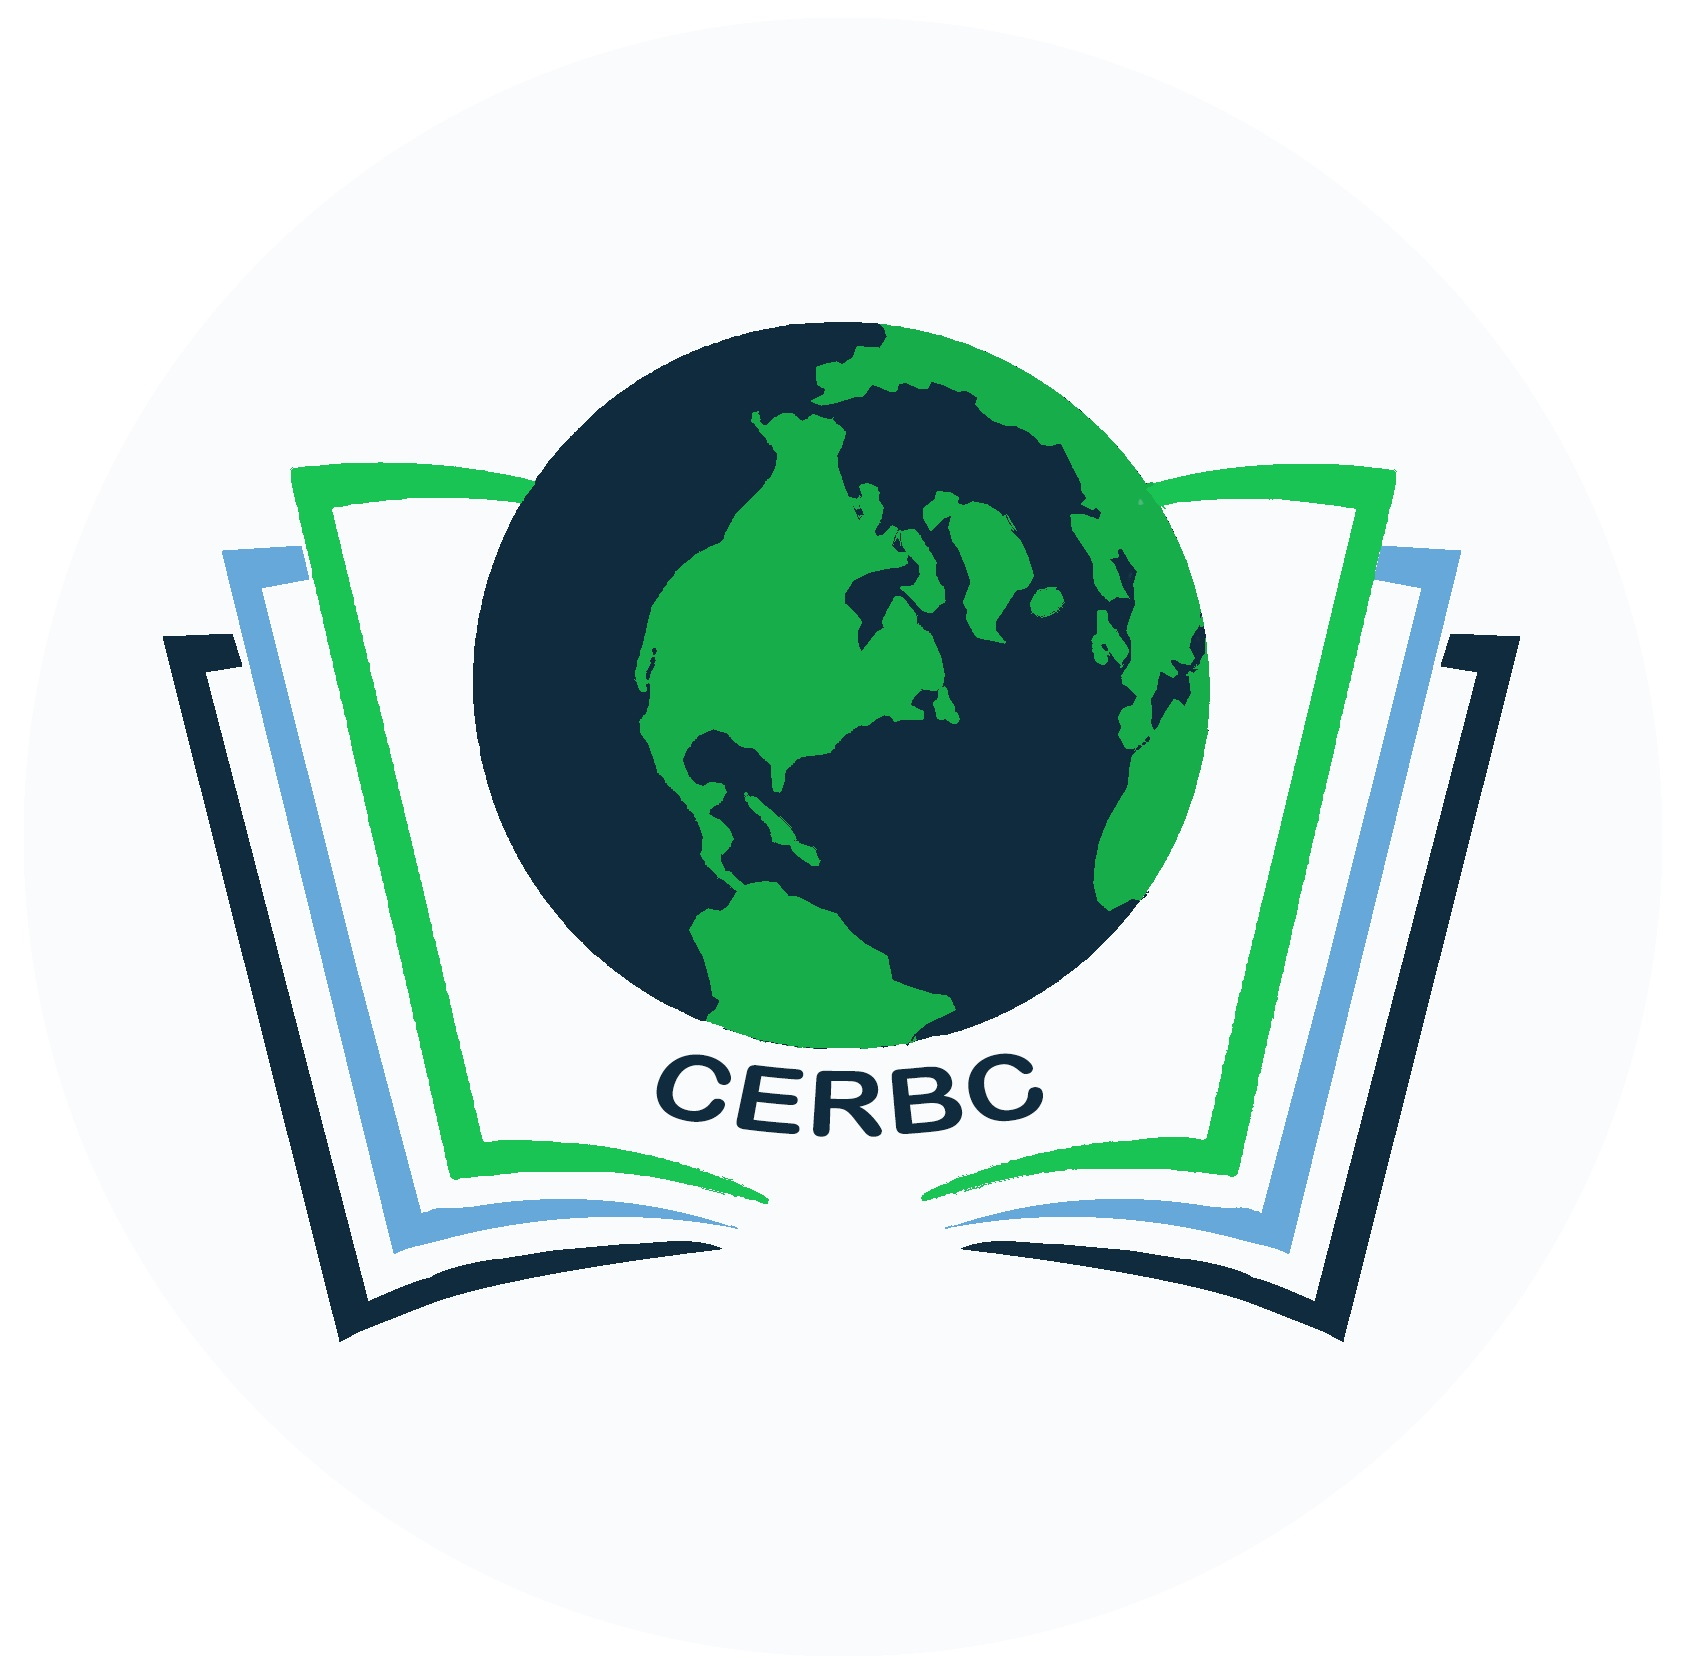 Logo of Climate Education Reform British Columbia.